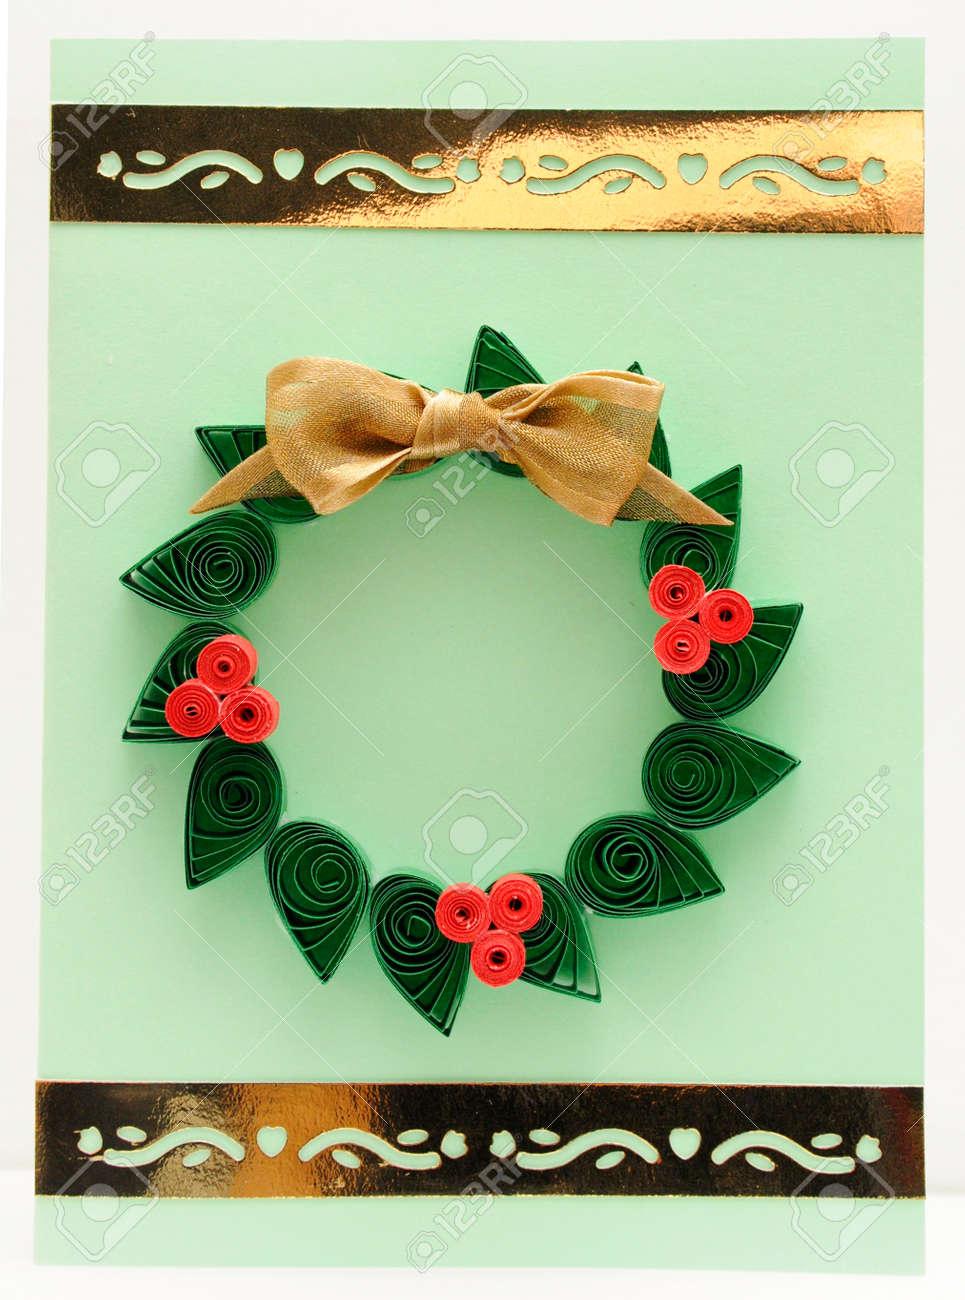 Christmas Mistletoe Wreath Quilling Christmas Card Stock Photo